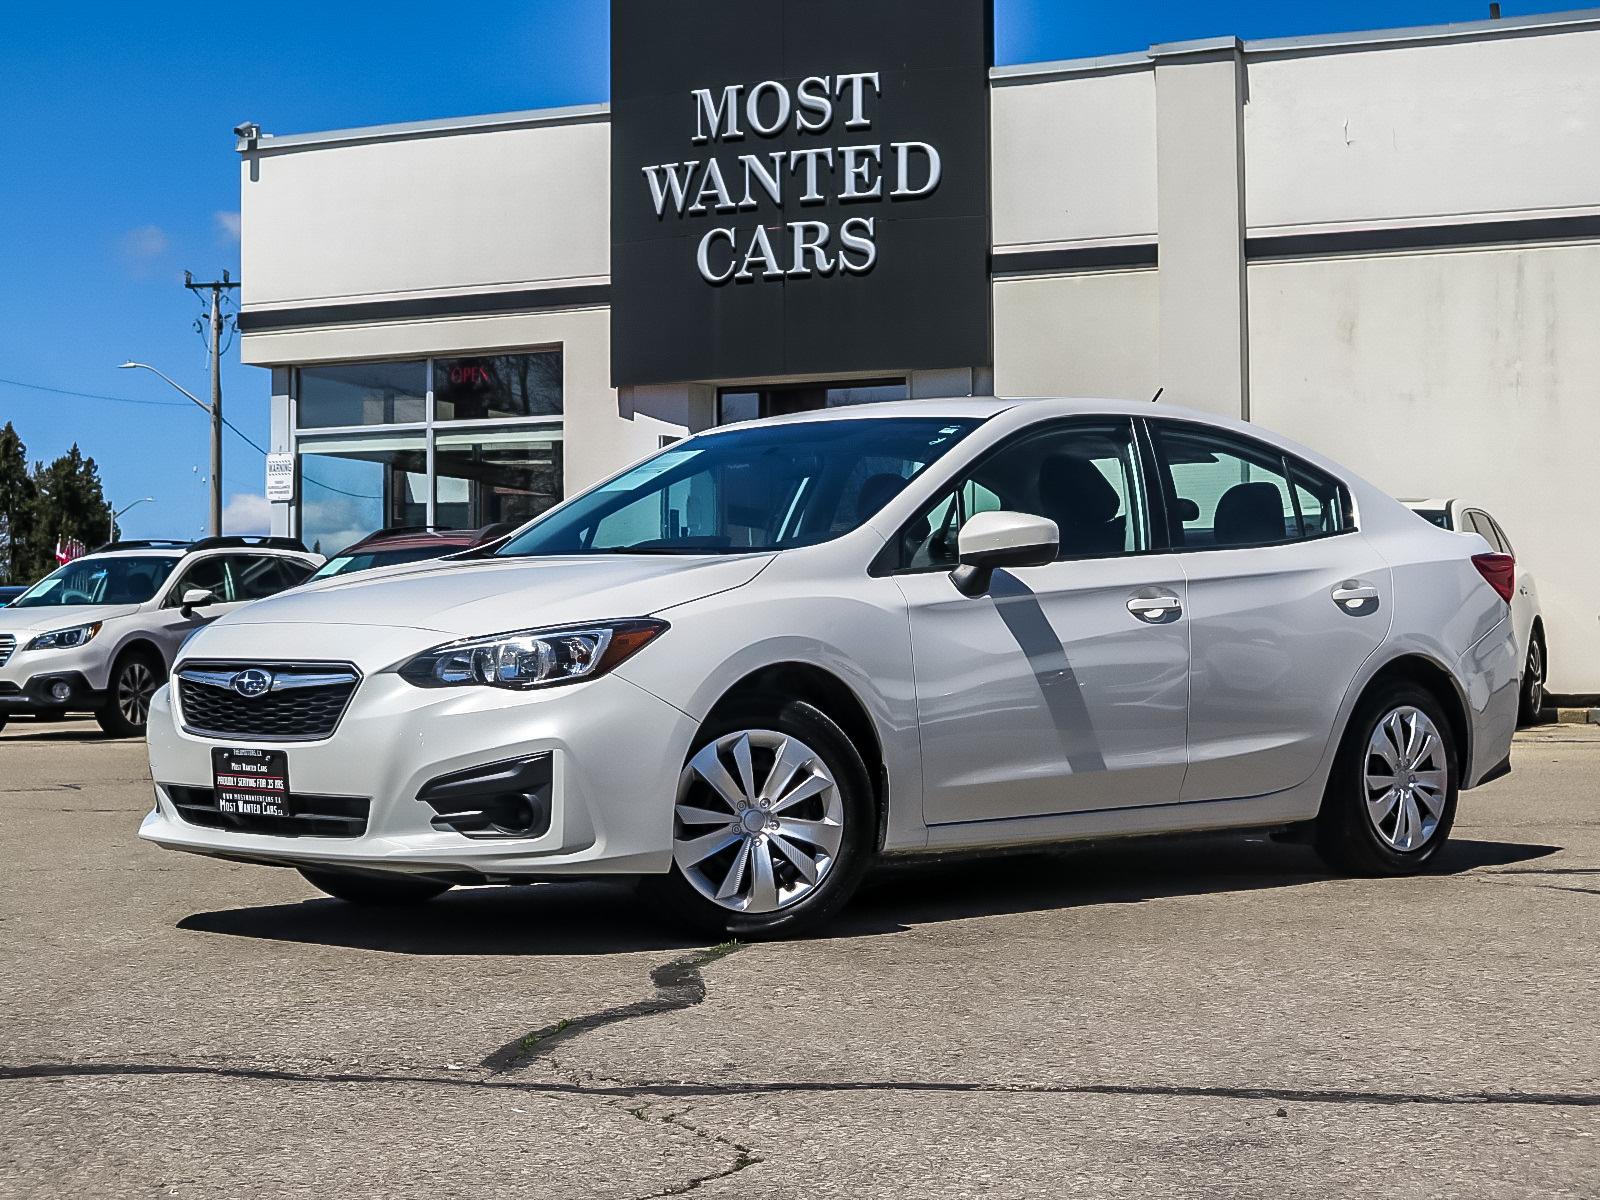 used 2017 Subaru Impreza car, priced at $16,982